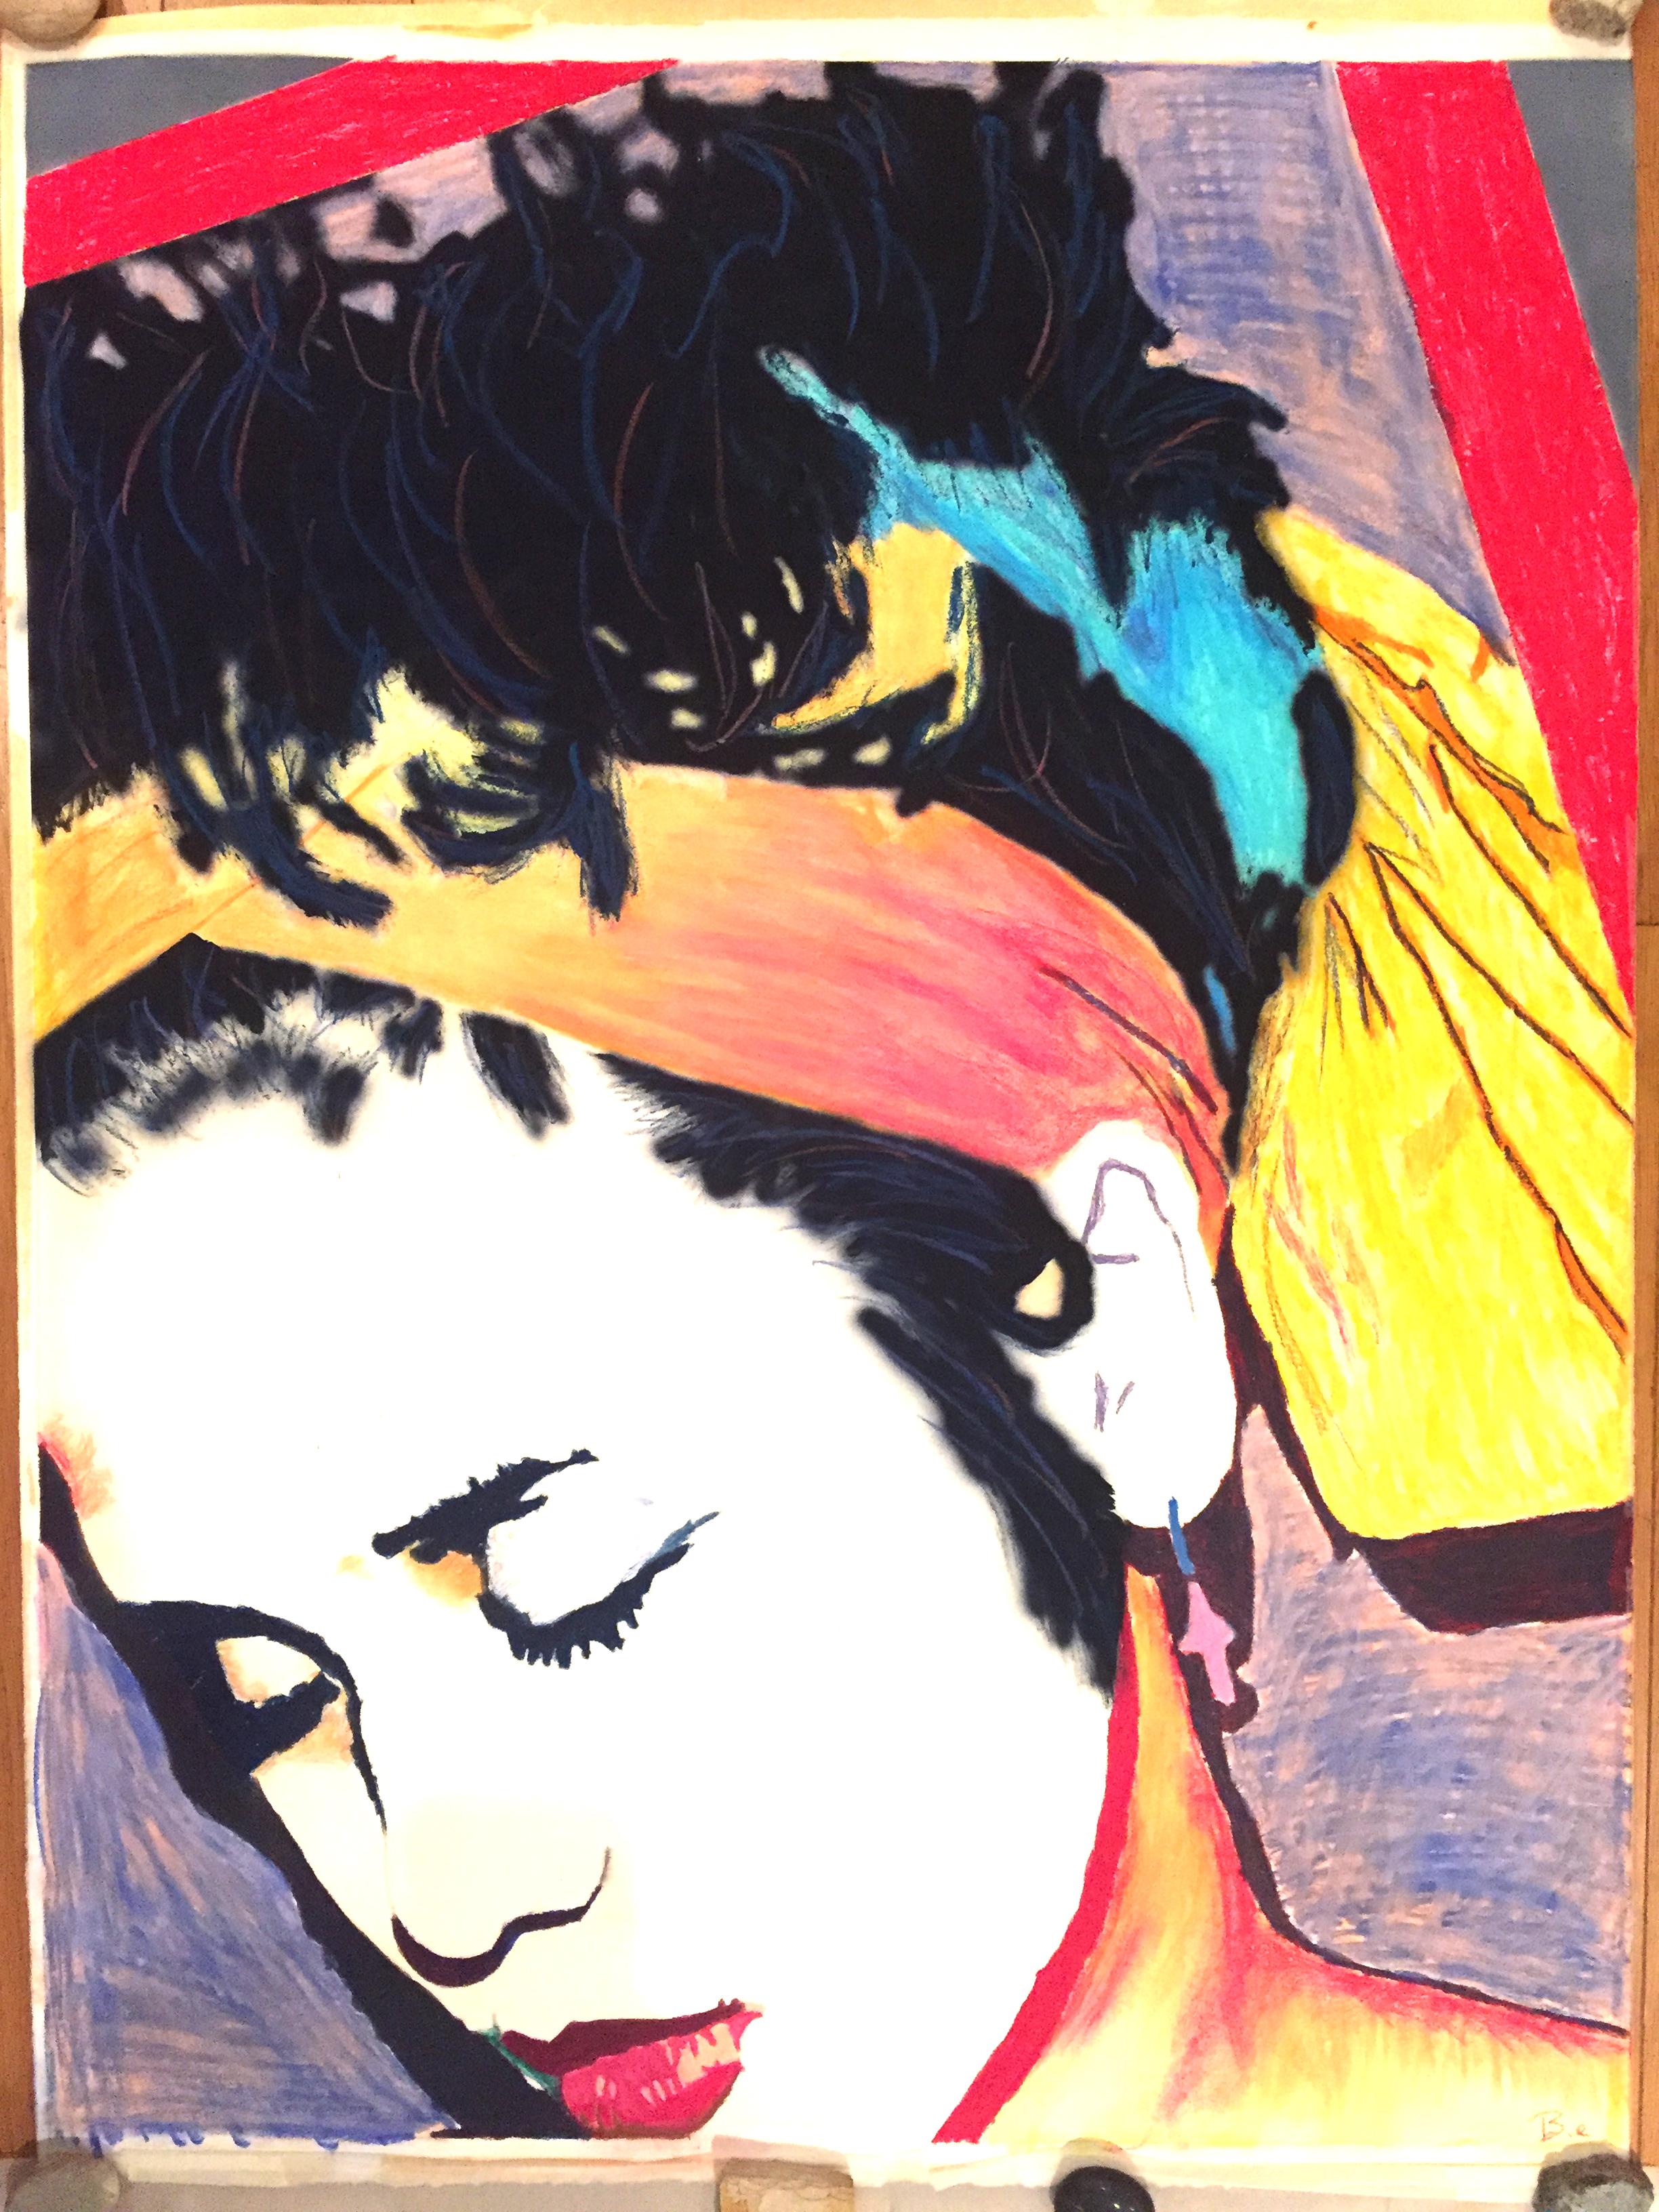 Self Portrait, mixed media on watercolor paper, 36x48